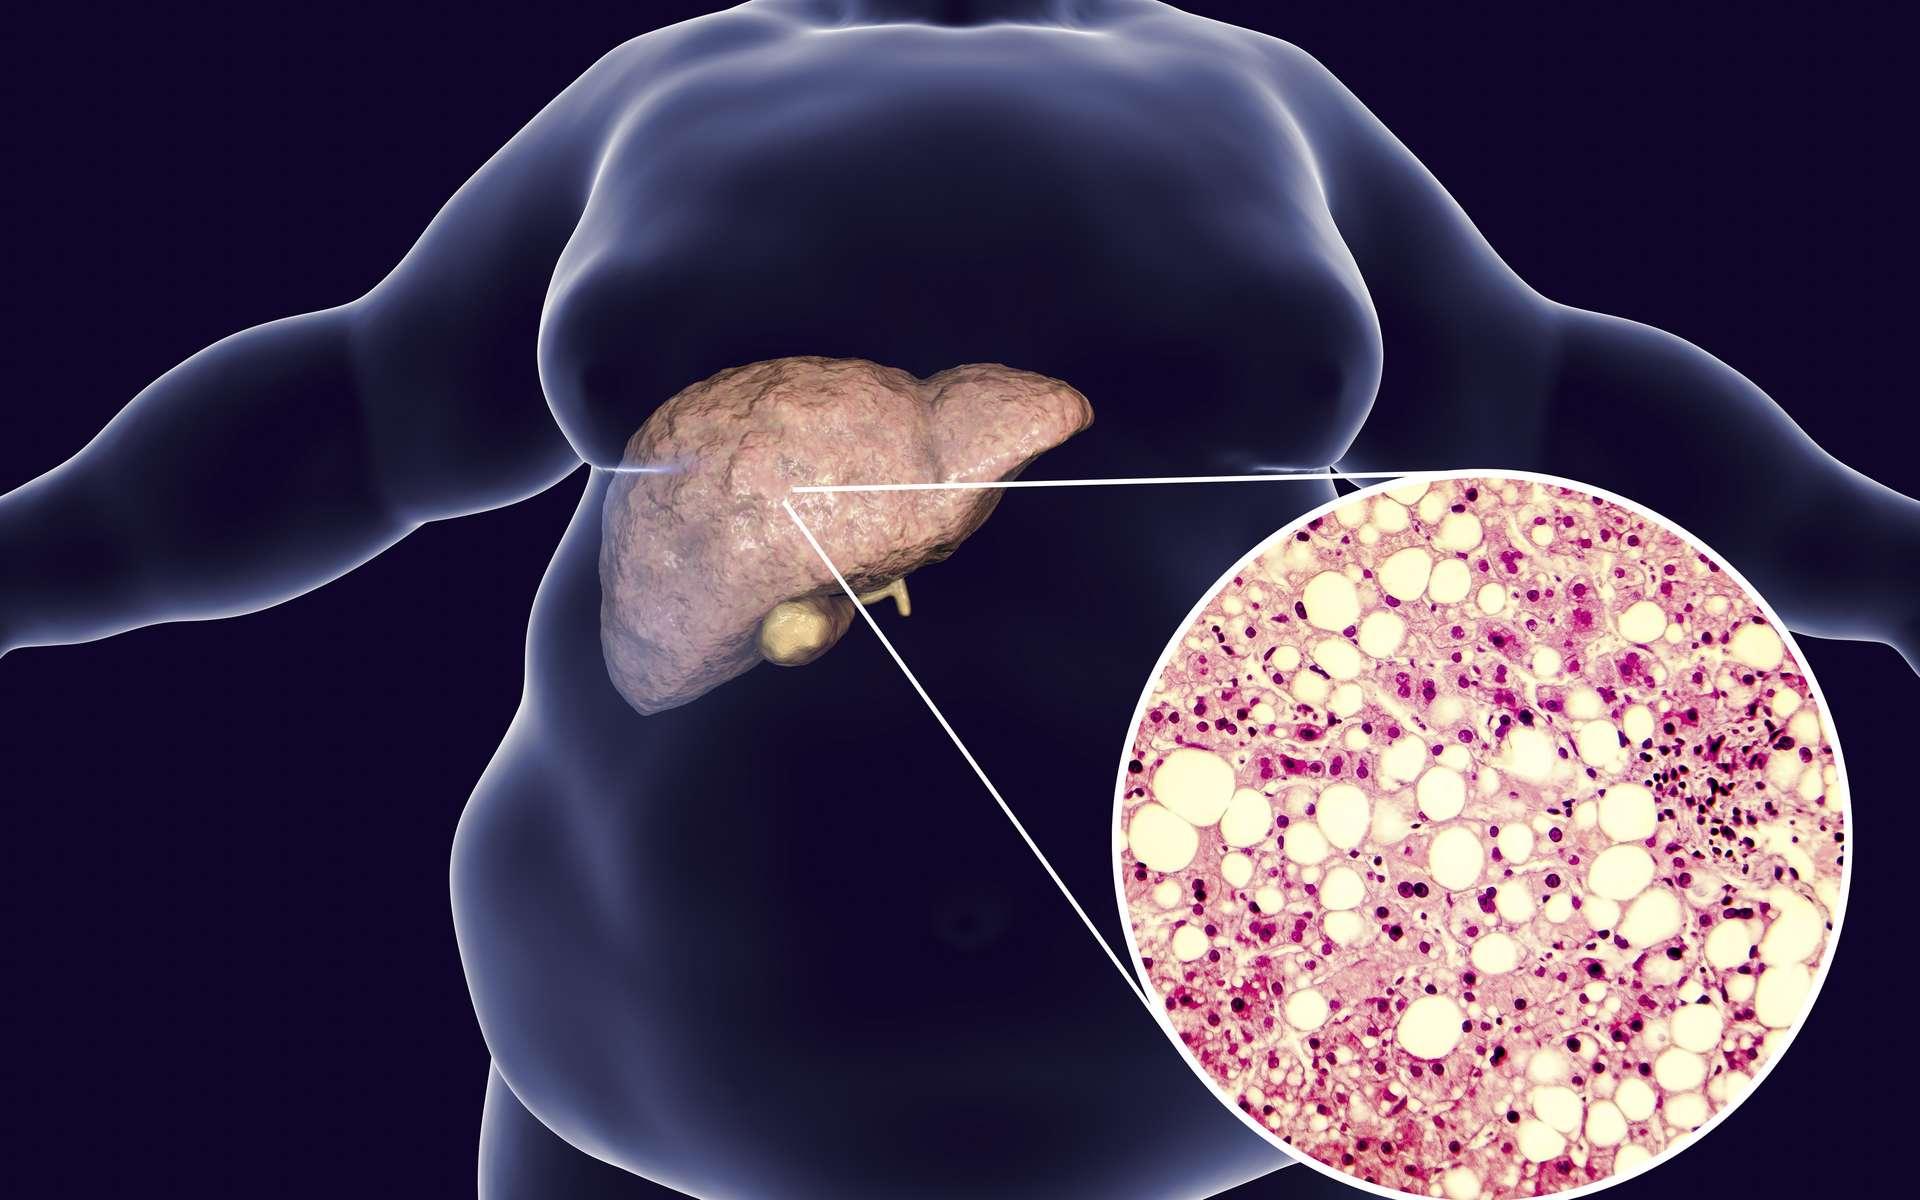 Stéatose du foie chez un homme obèse © Kateryna_Kan, Adobe Stock